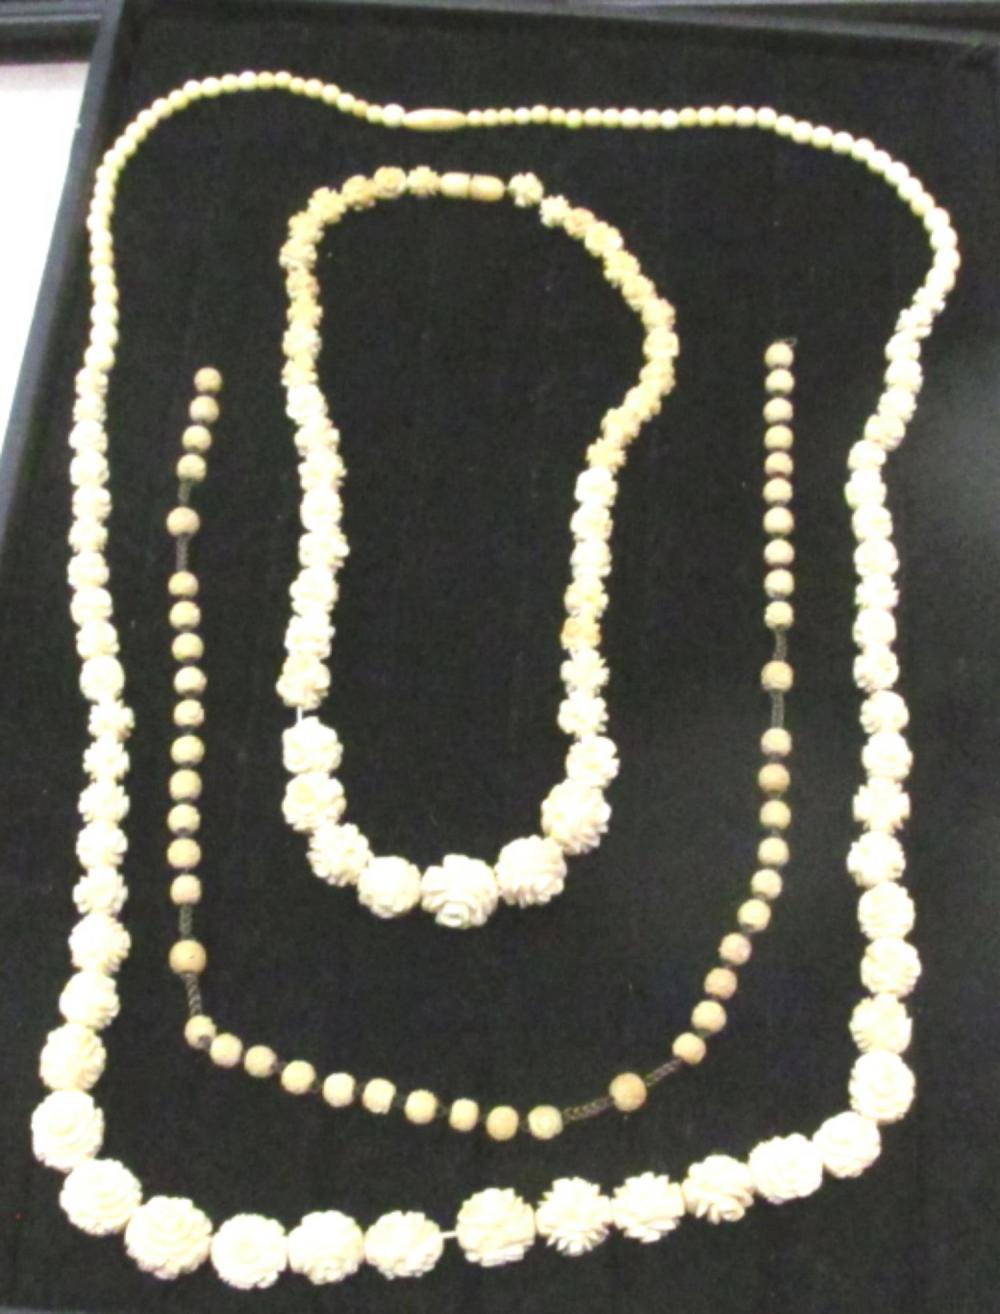 3 Vintage Ivory Like Rose Necklaces